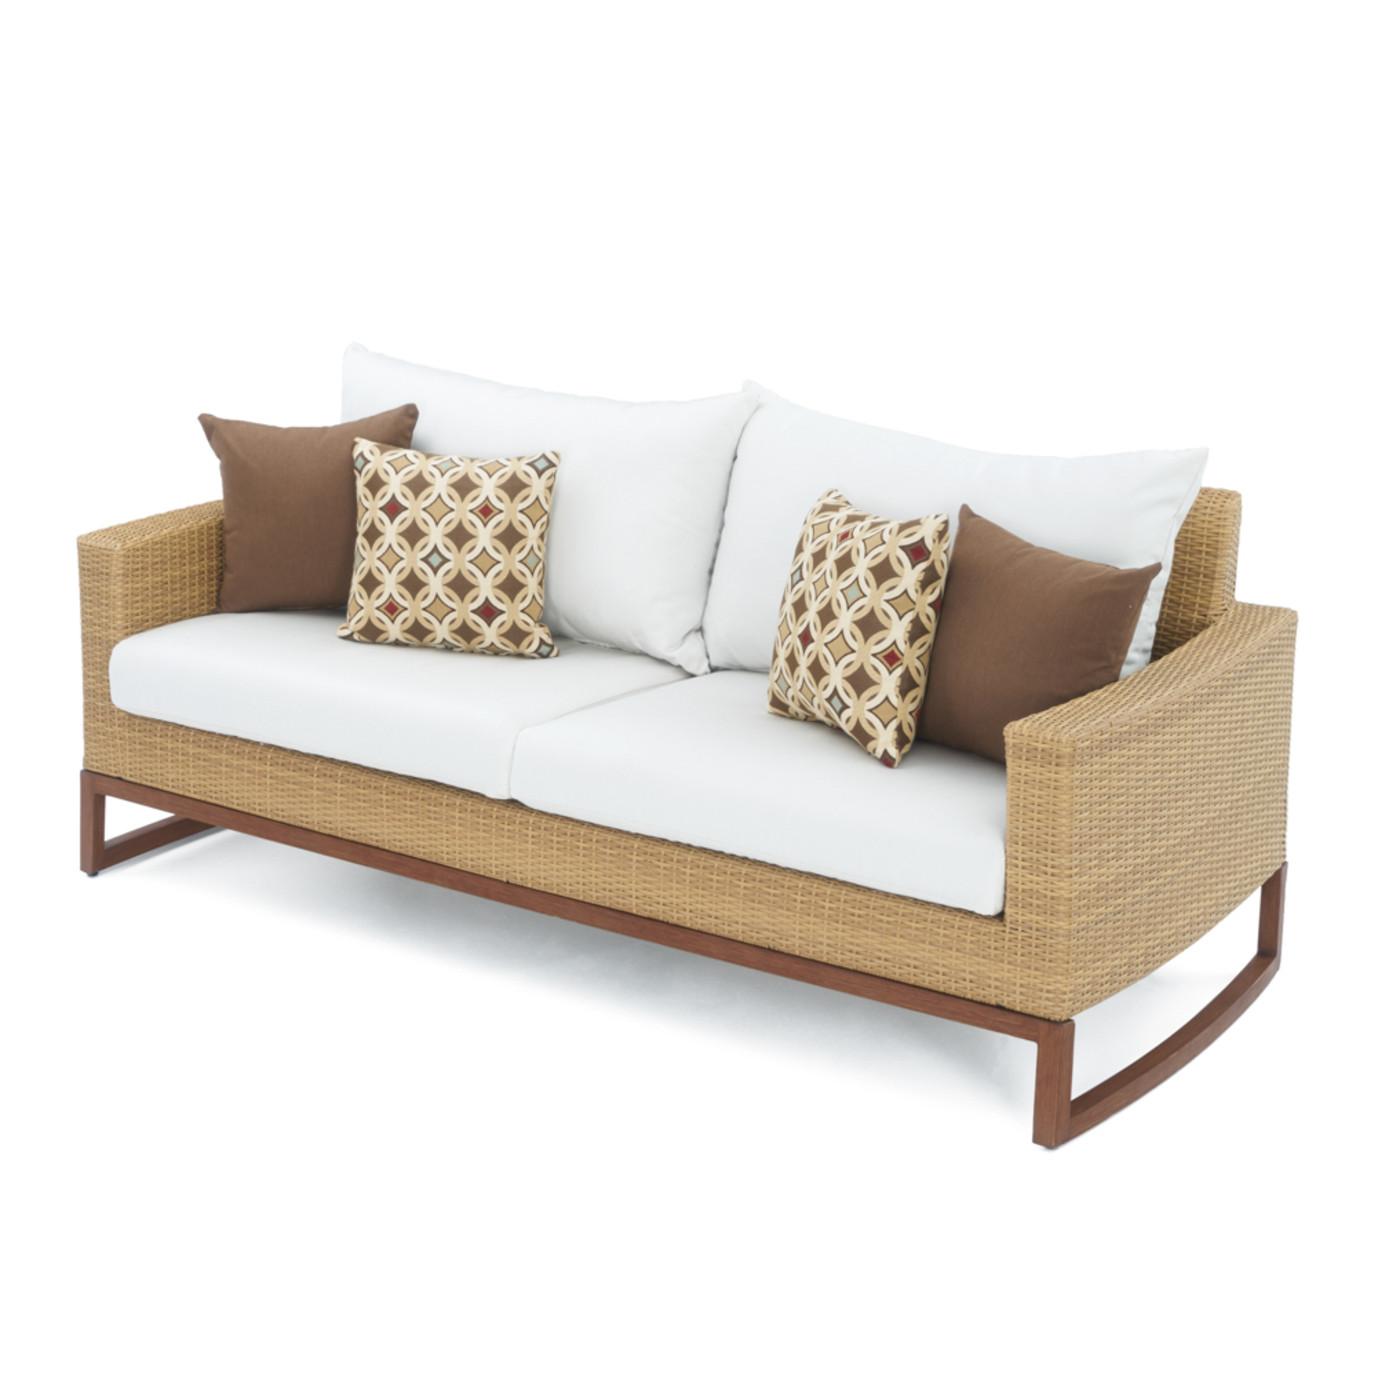 Milea™ 4pc Seating Set - Moroccan Cream